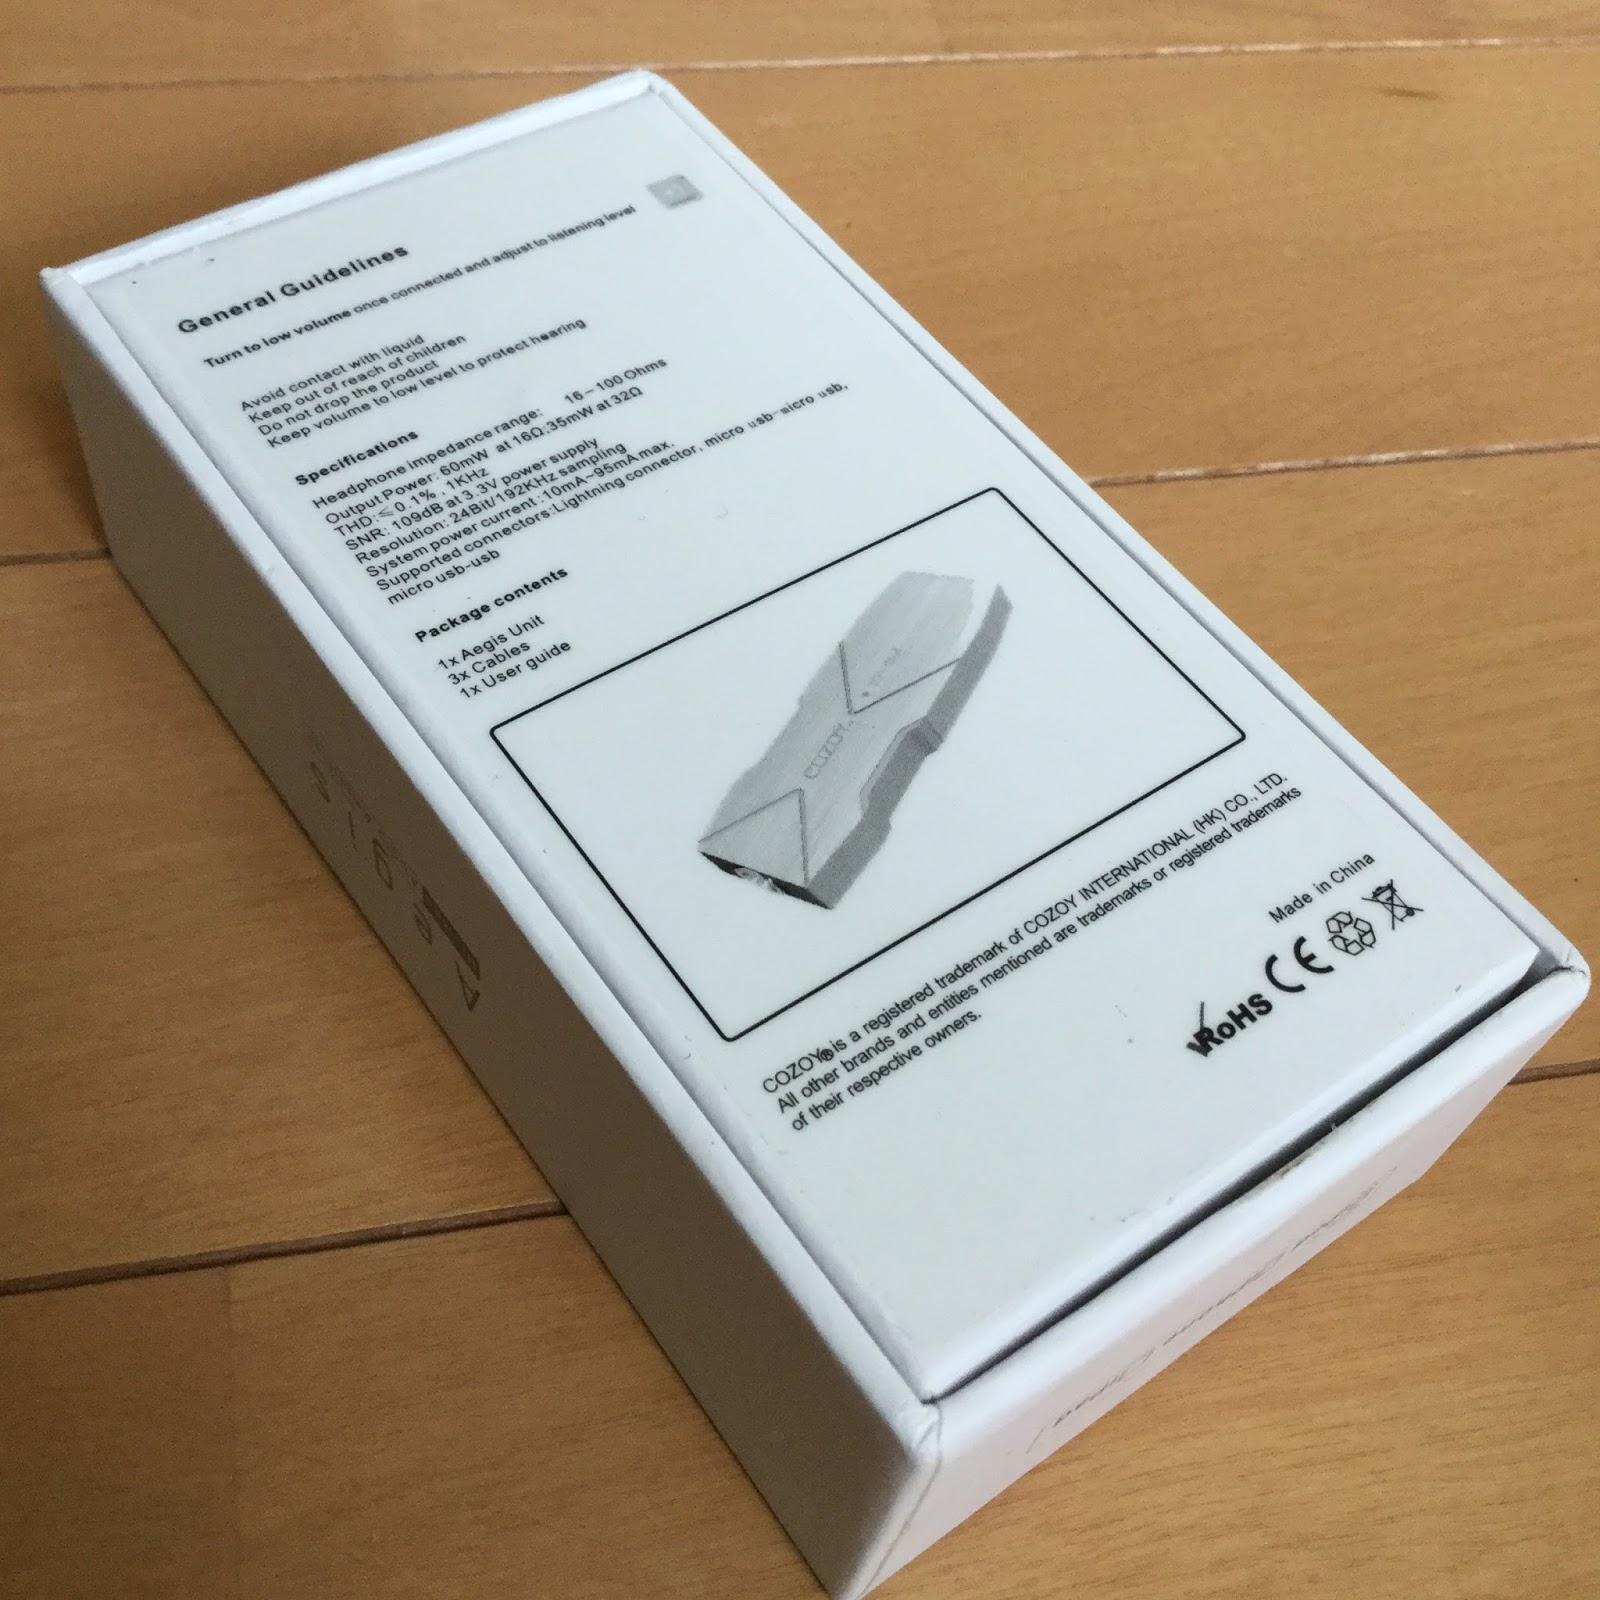 Cozoy Aegis Portable 24 192 Dac Amp Reviews Head Fi Org